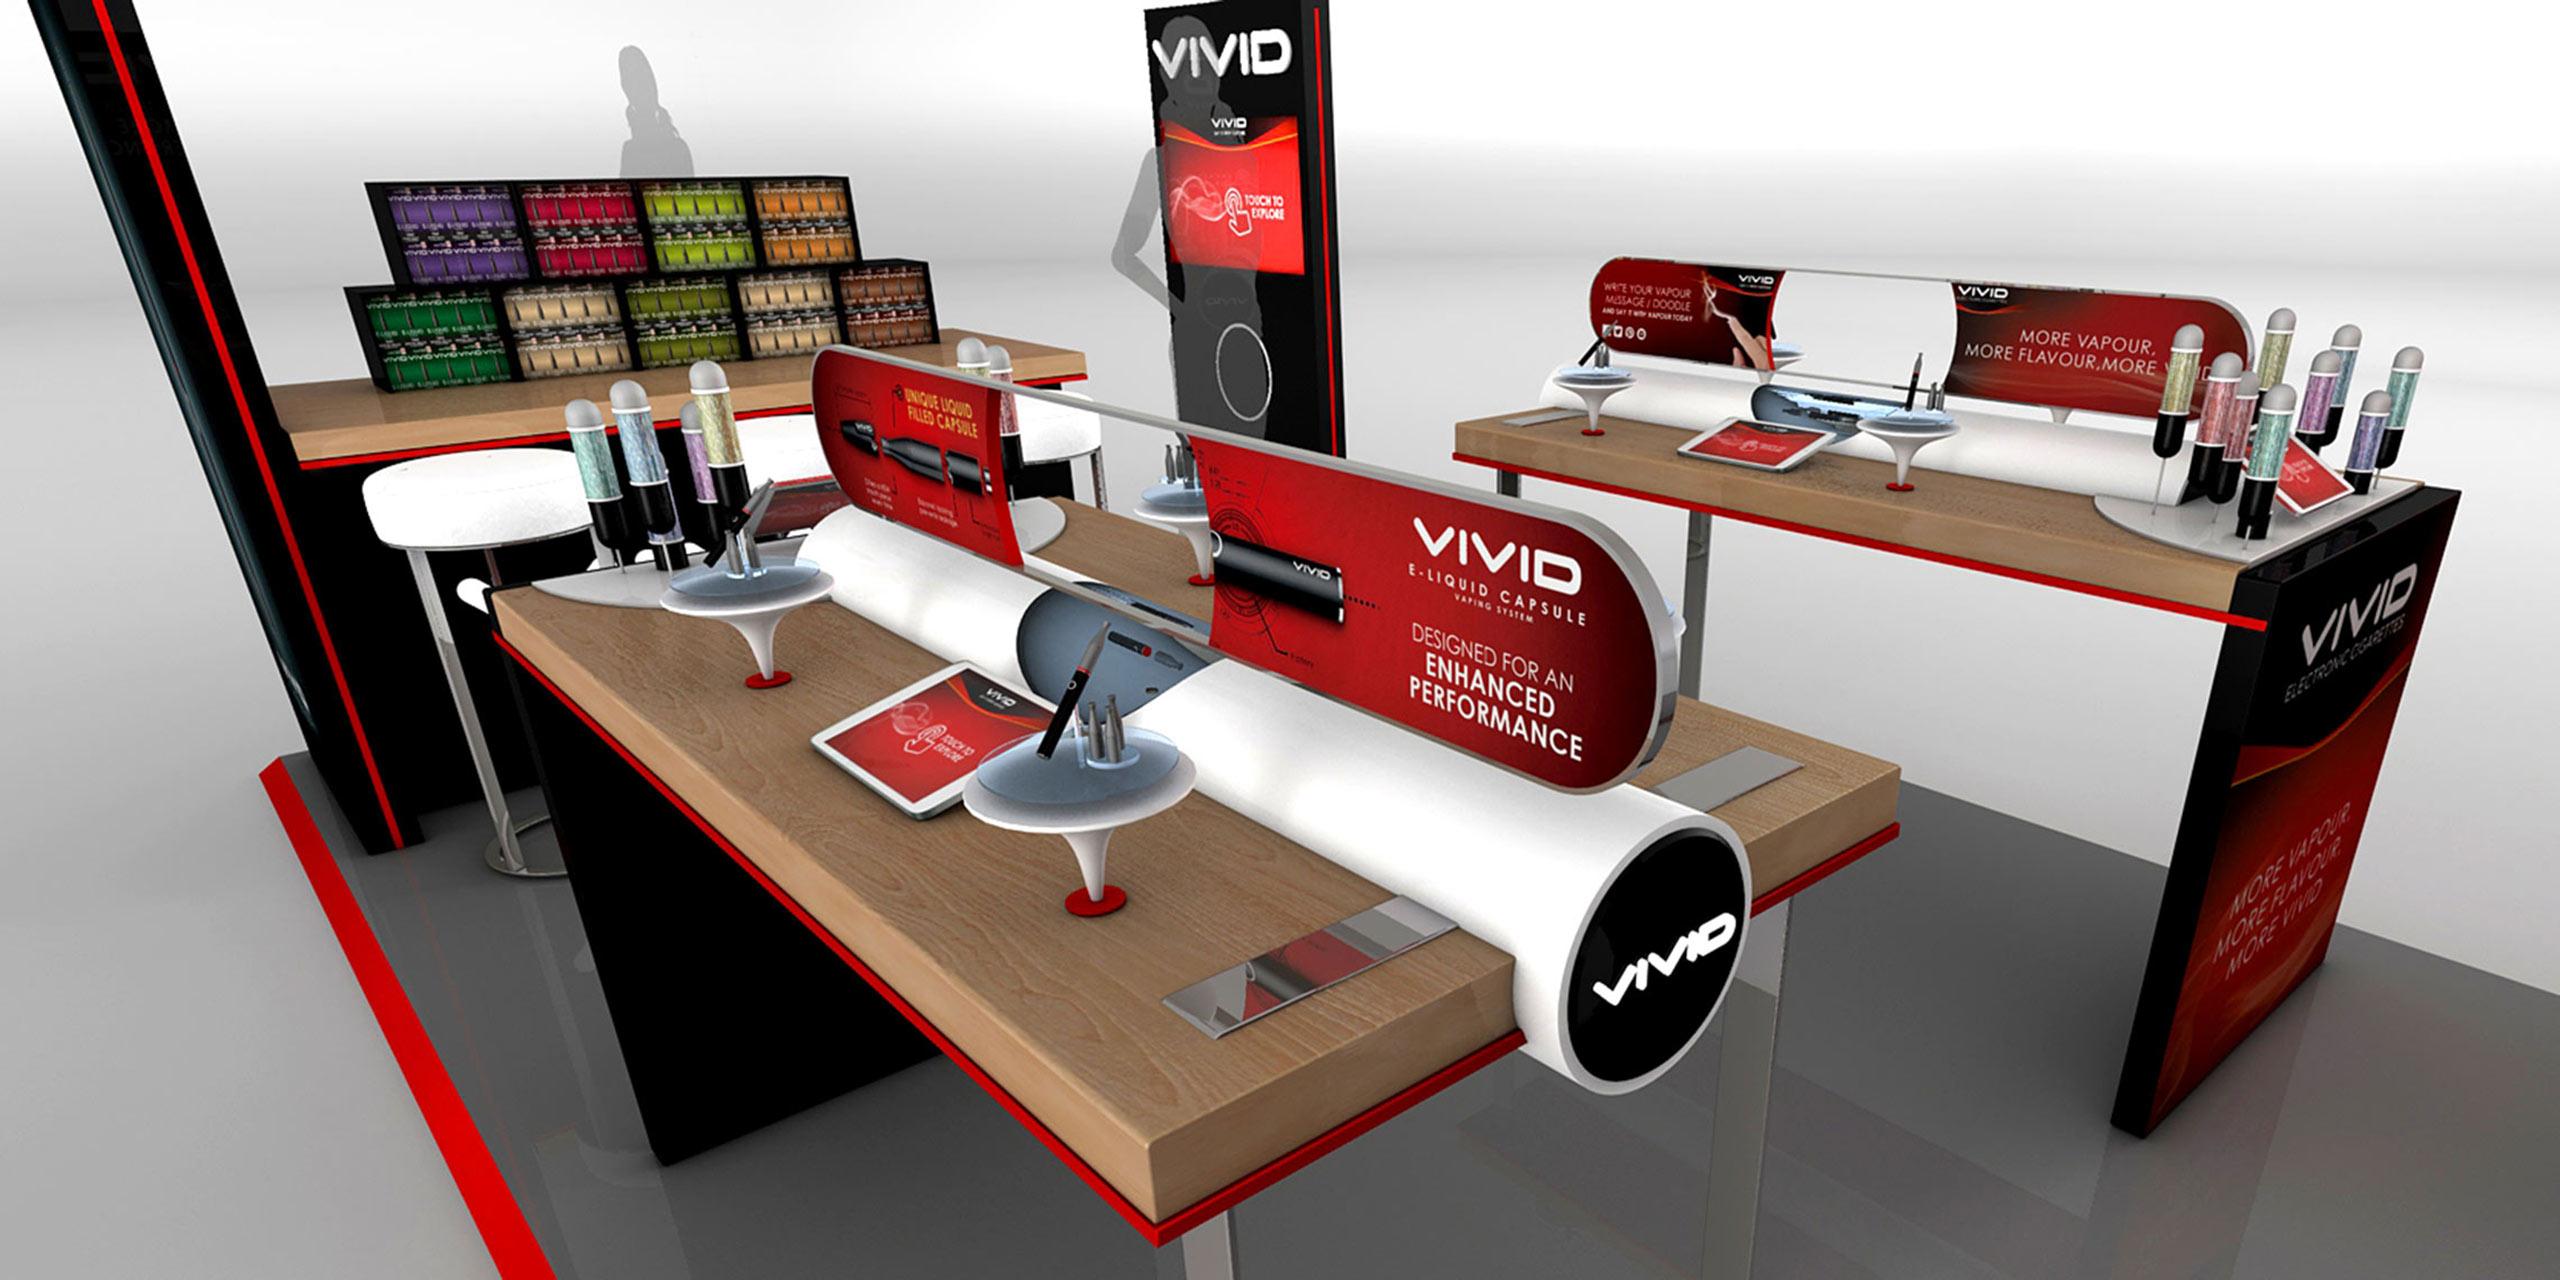 Vivid E-Cigarette POS Retail Display - Cirka Creative